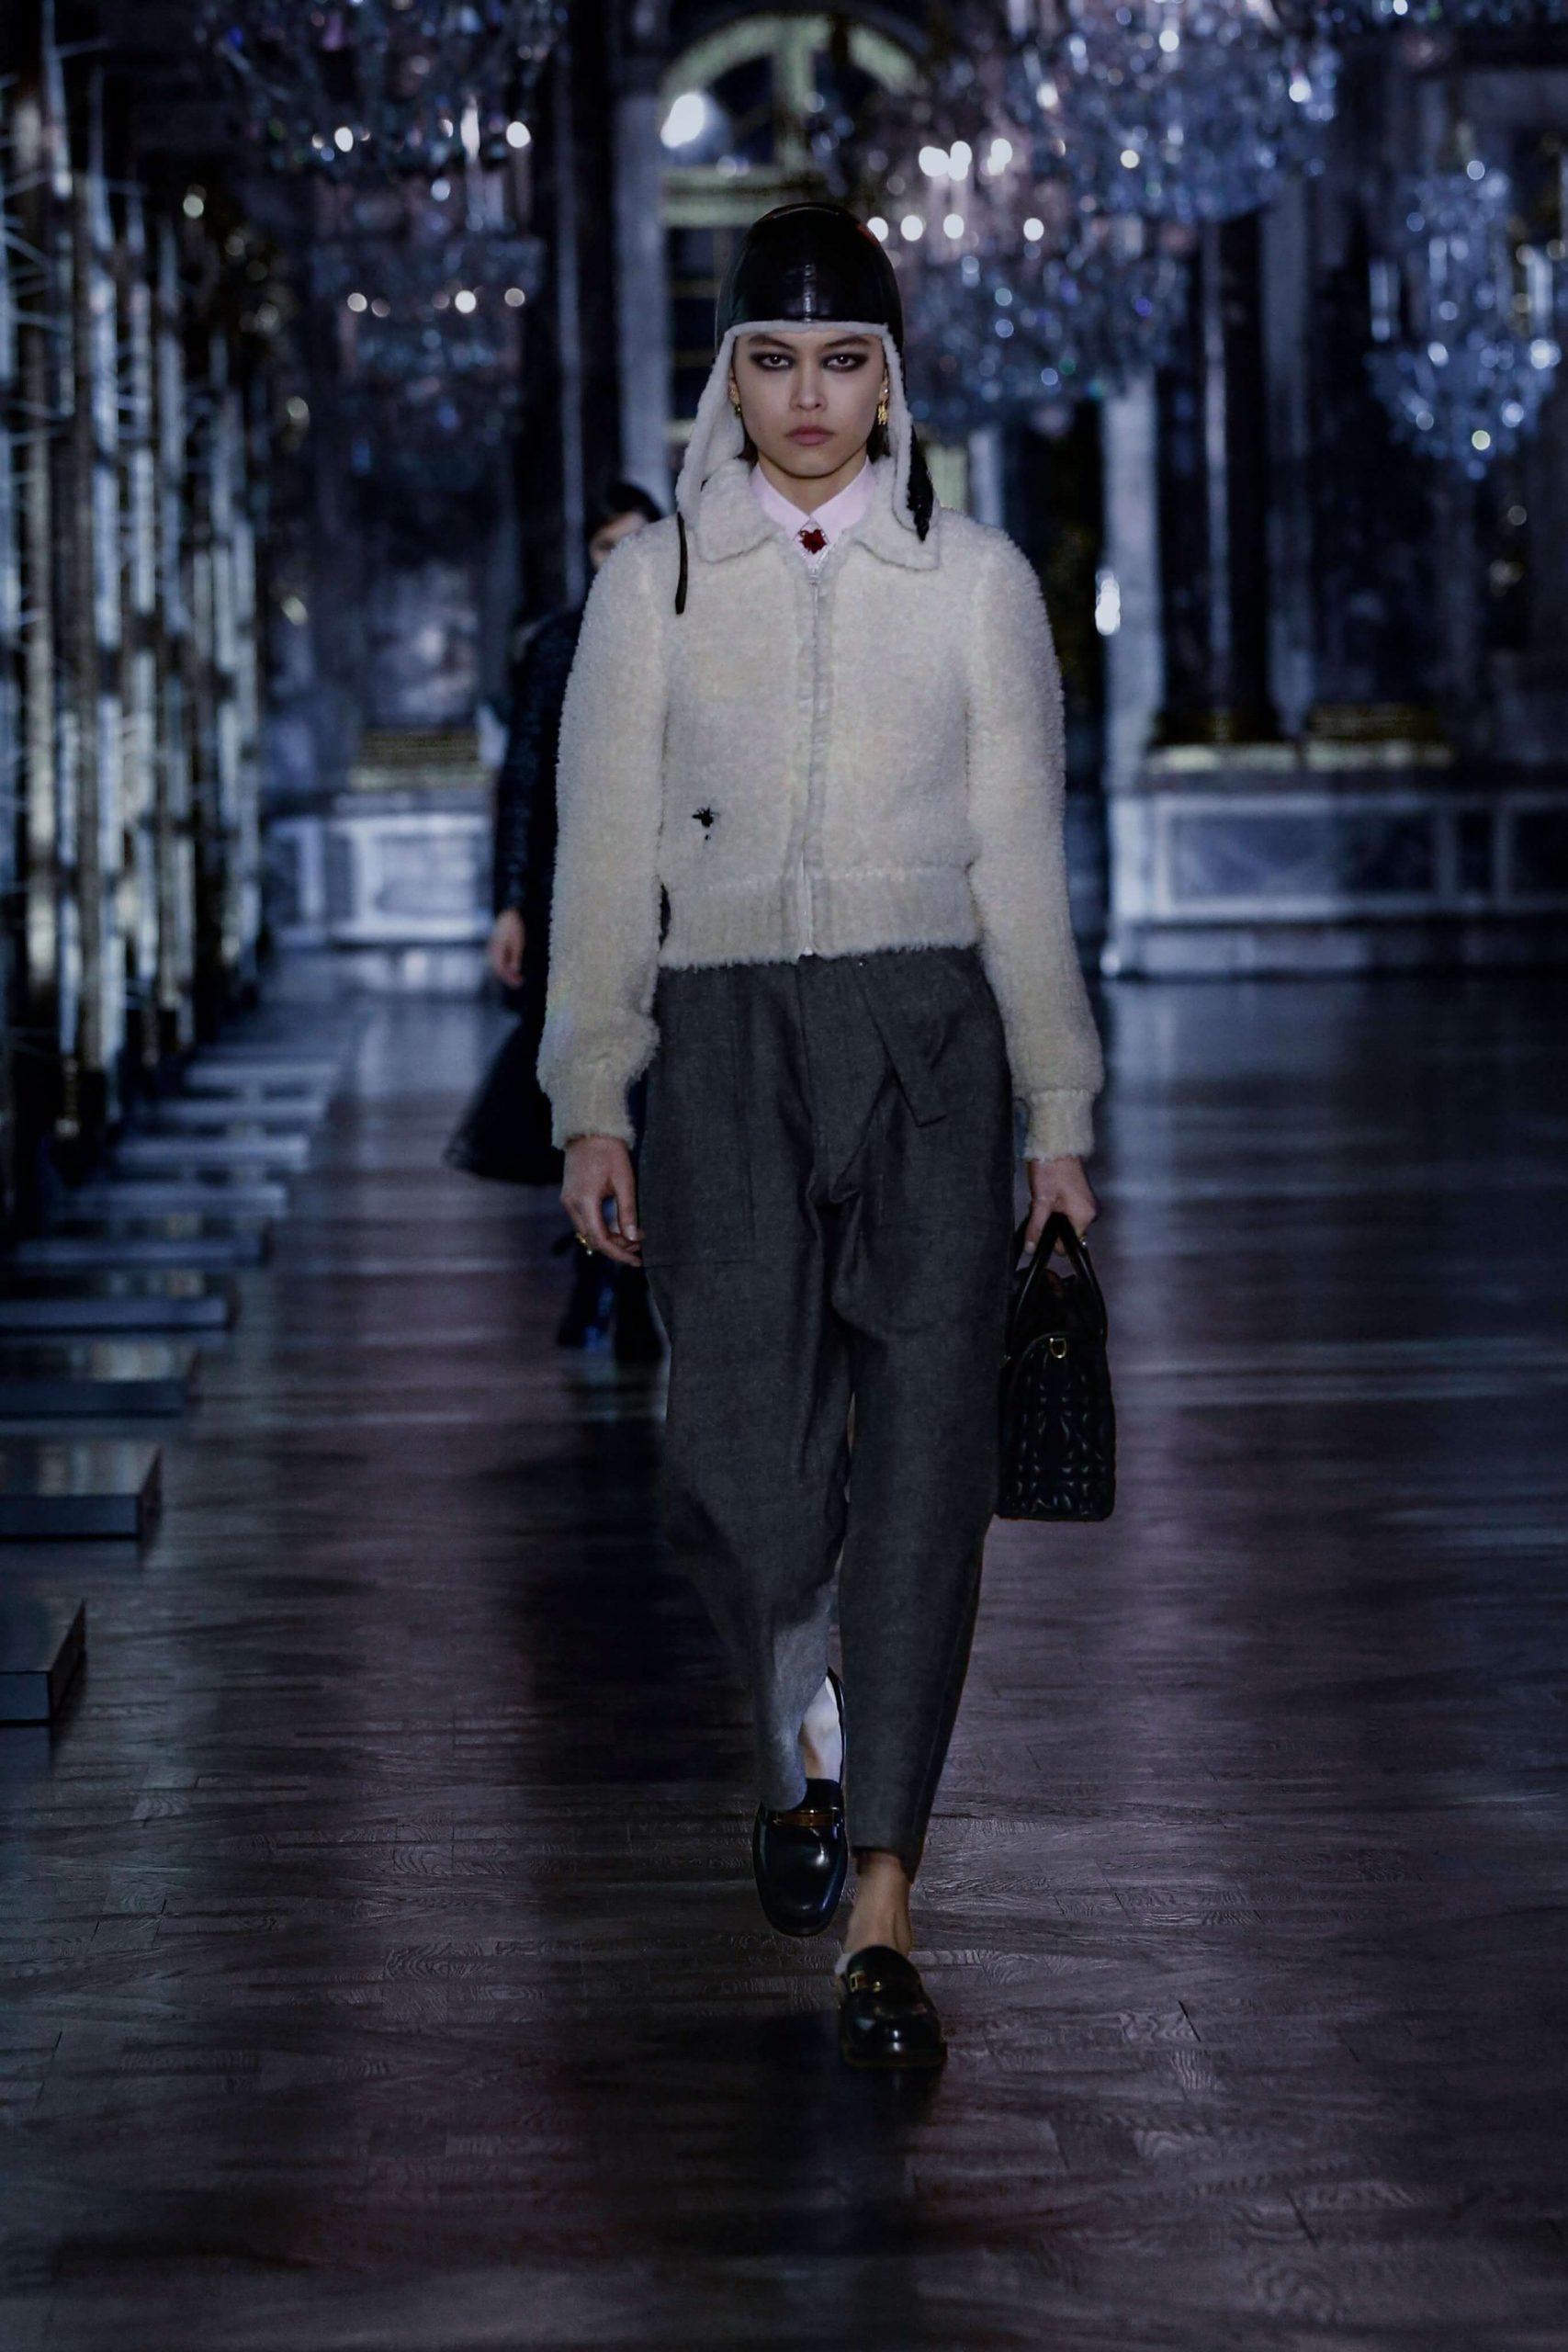 00021 Christian Dior Fall 21